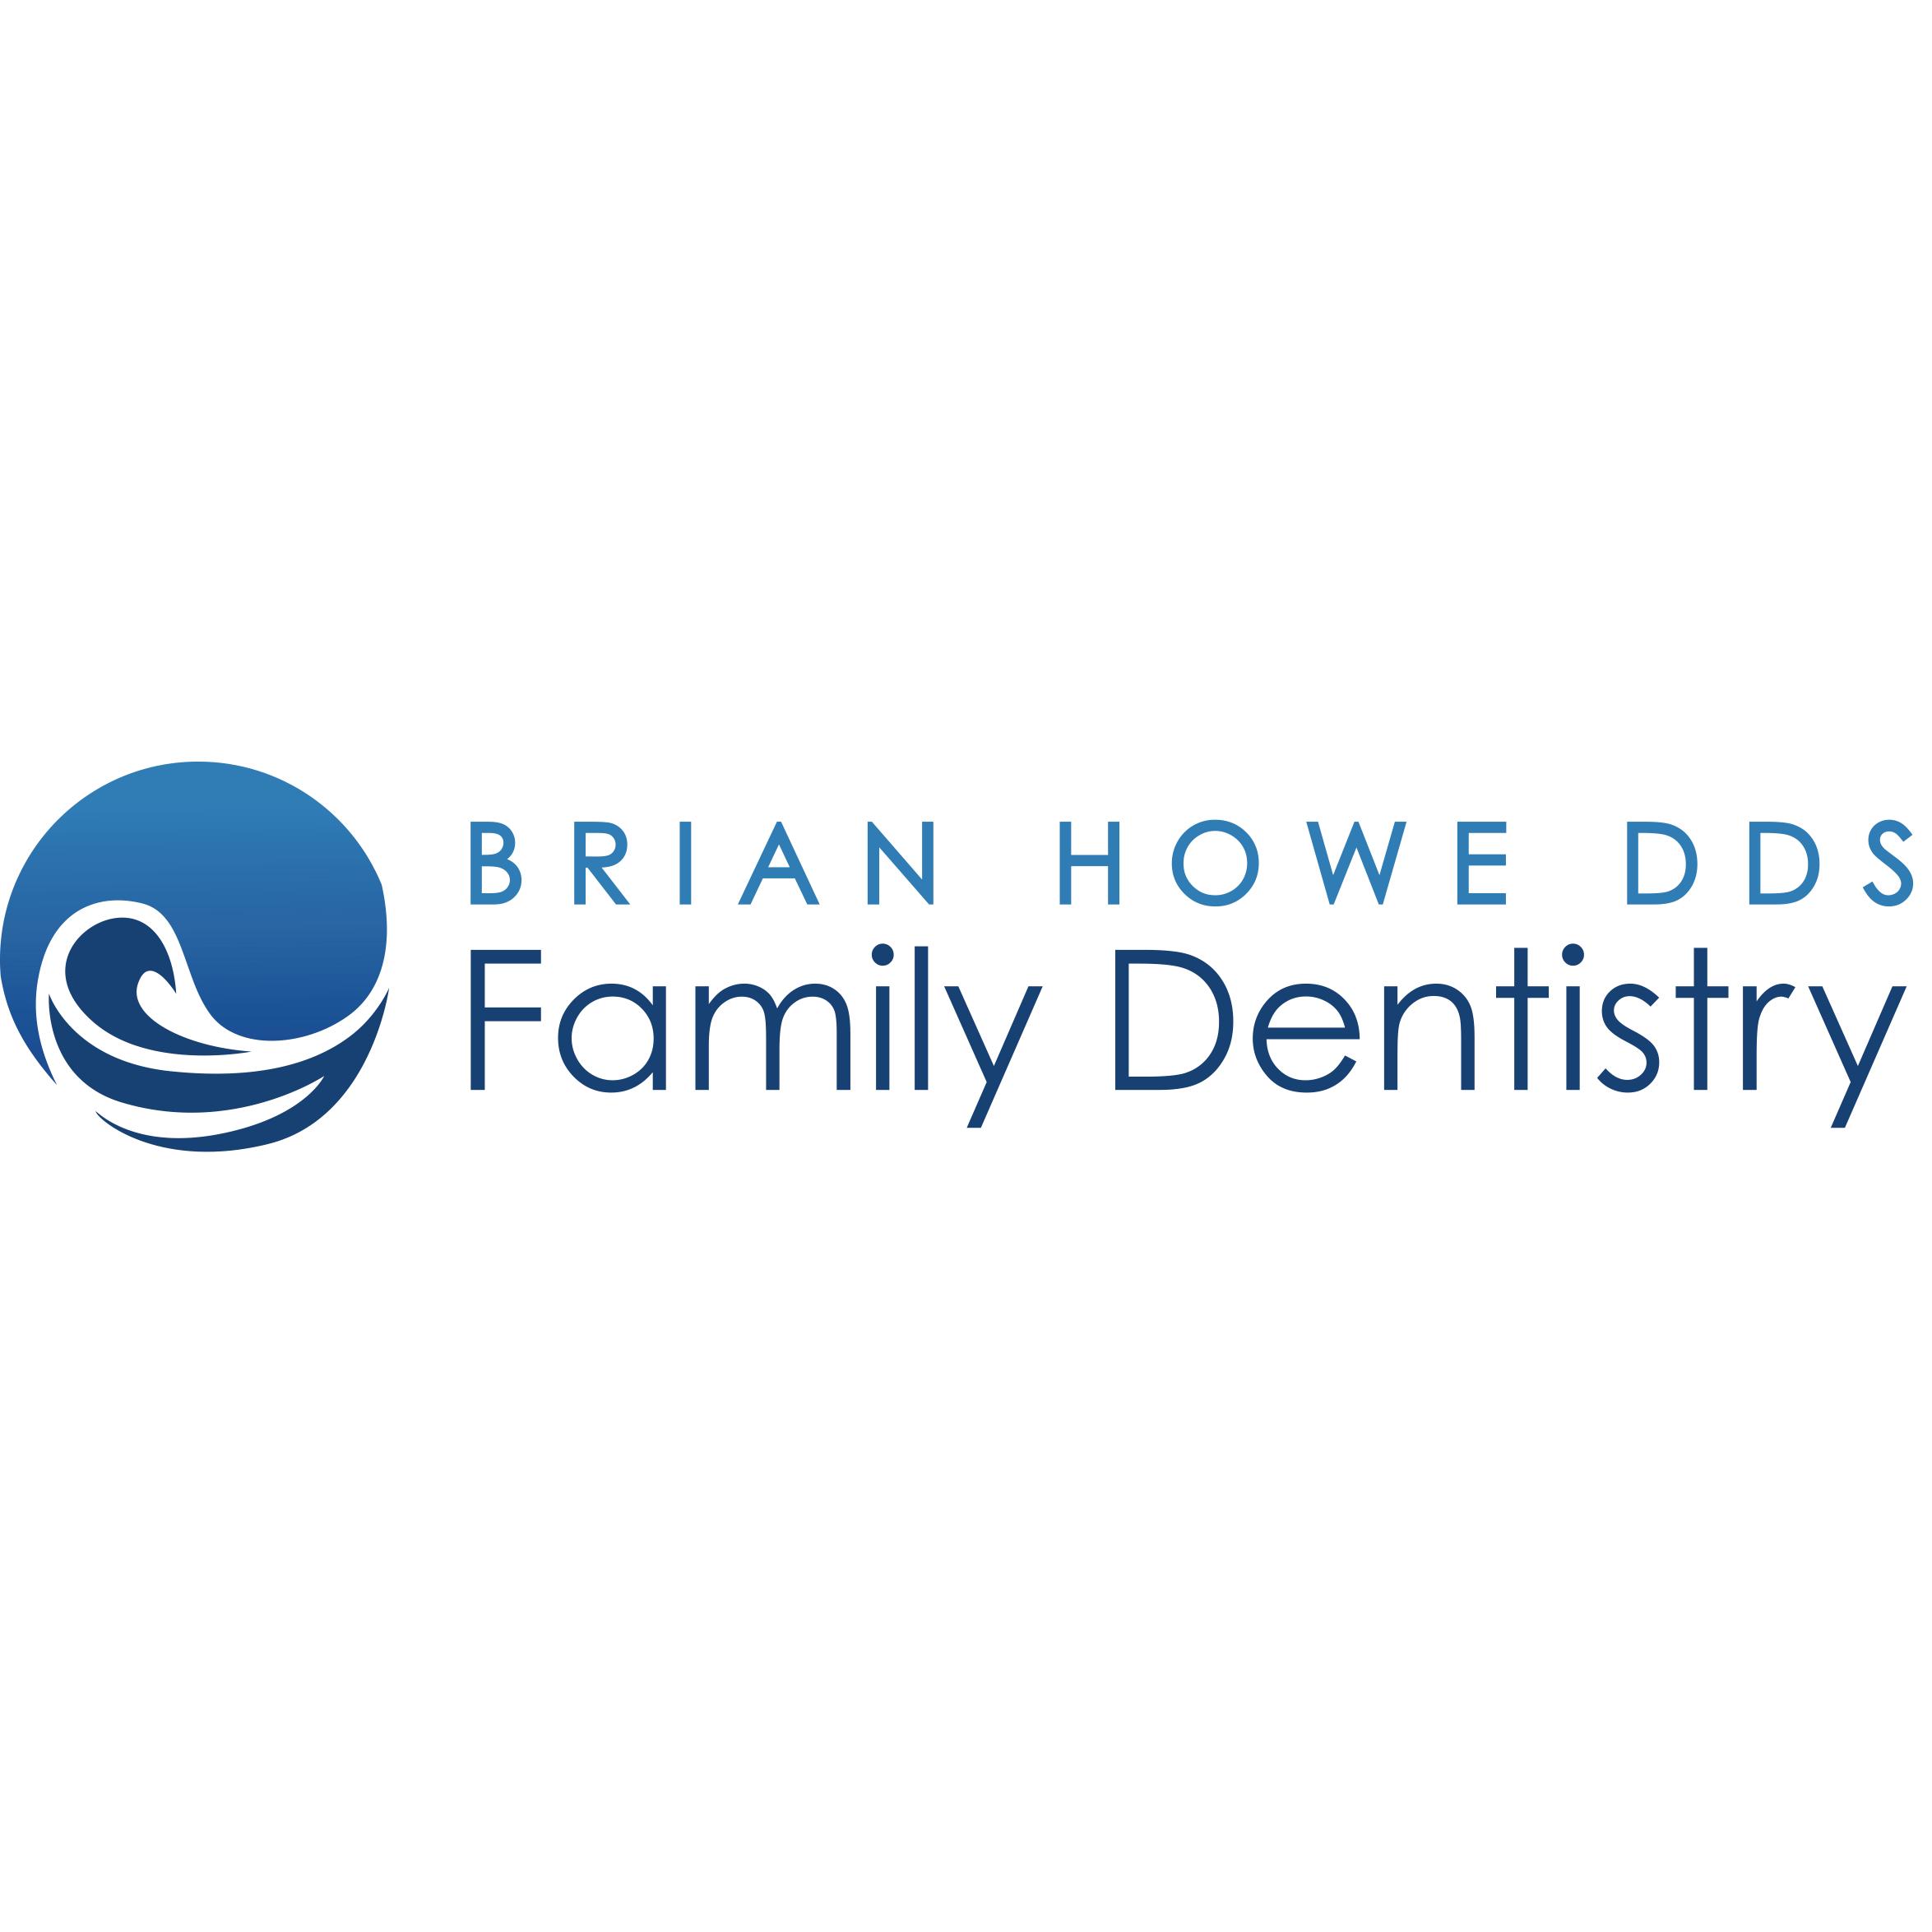 Brian Howe DDS, Family Dentistry